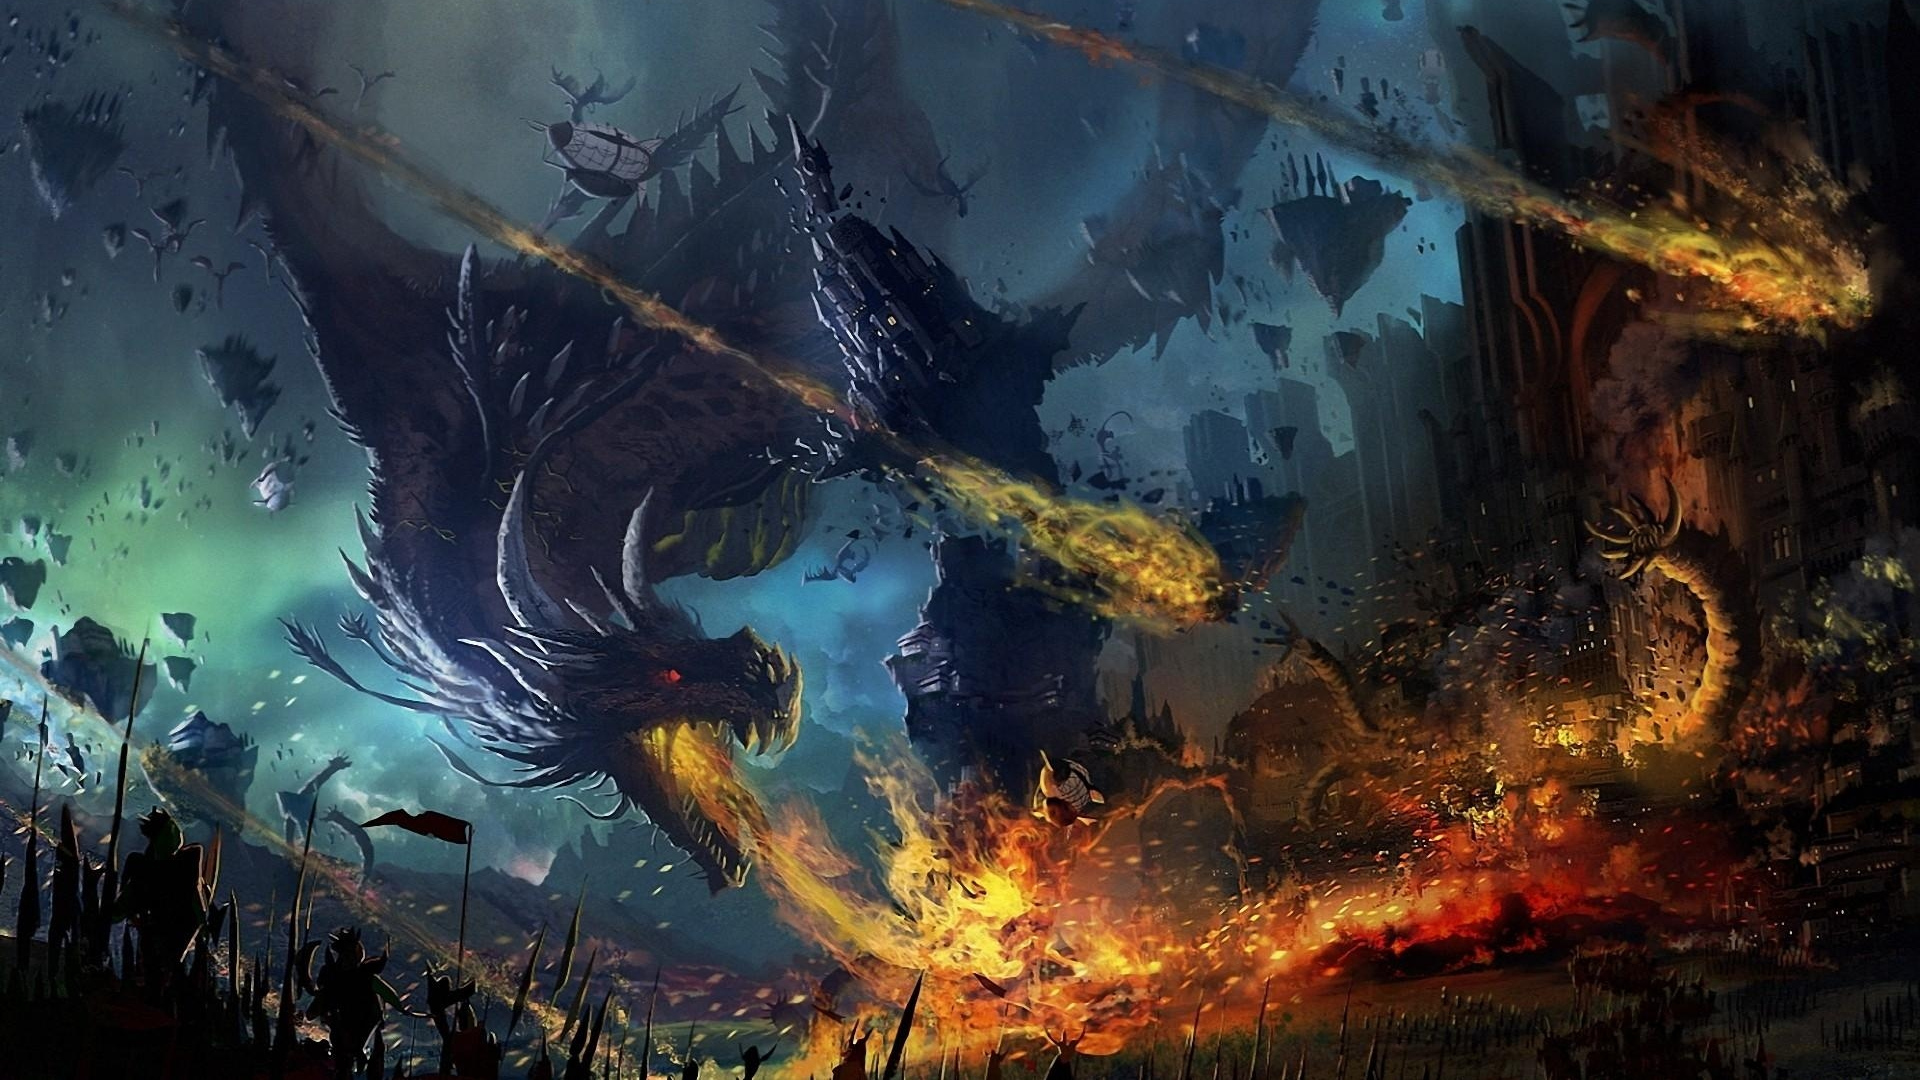 Fall Wallpaper For Cell Phone Dragon Fall Fire Flame War Battle Backgrounds 1920x1080